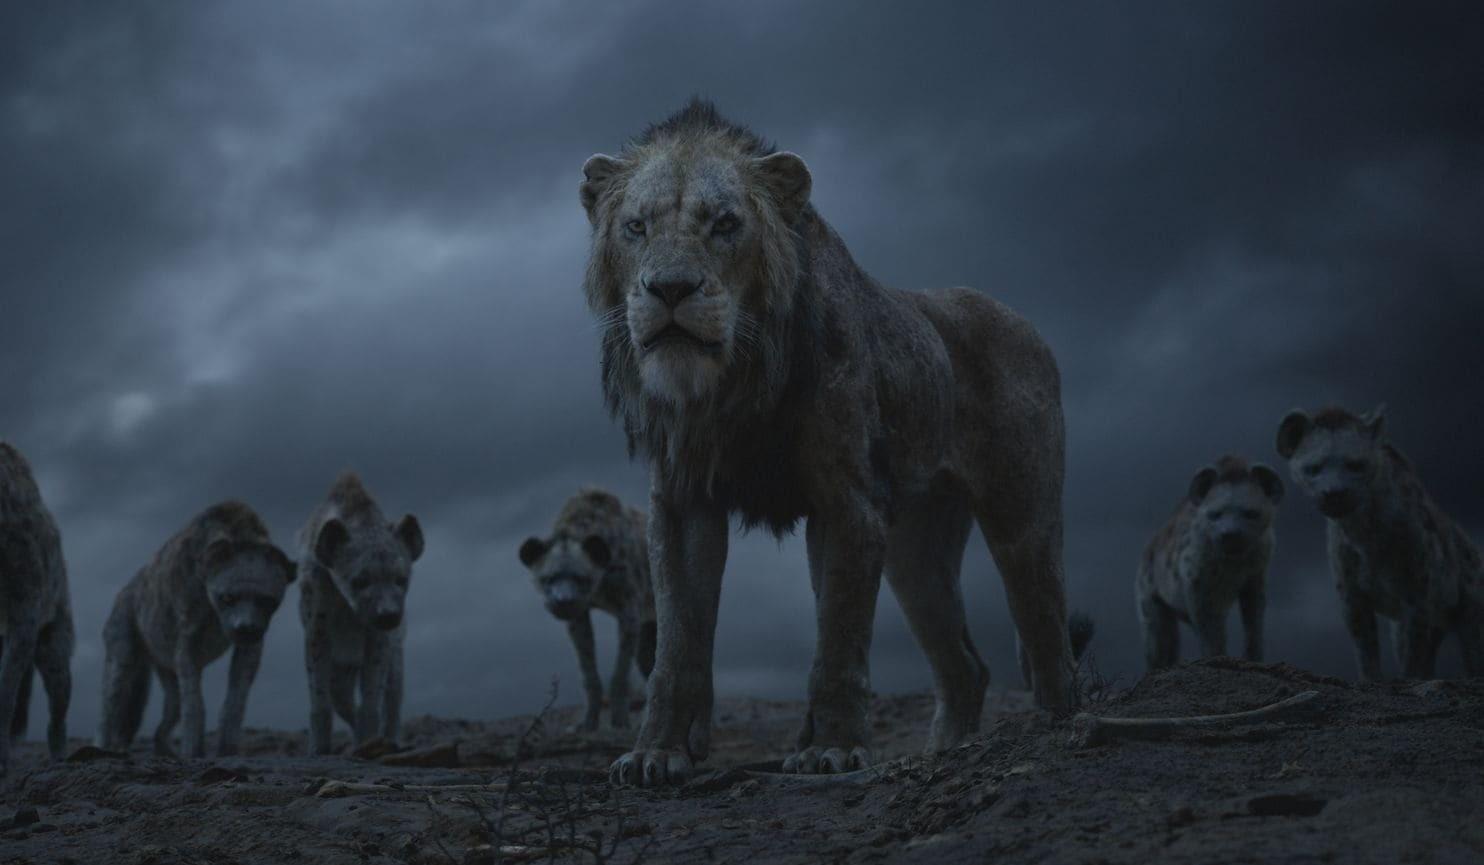 Putlocker Hq1080p Watch The Lion King 2019 Hd English Subtitle